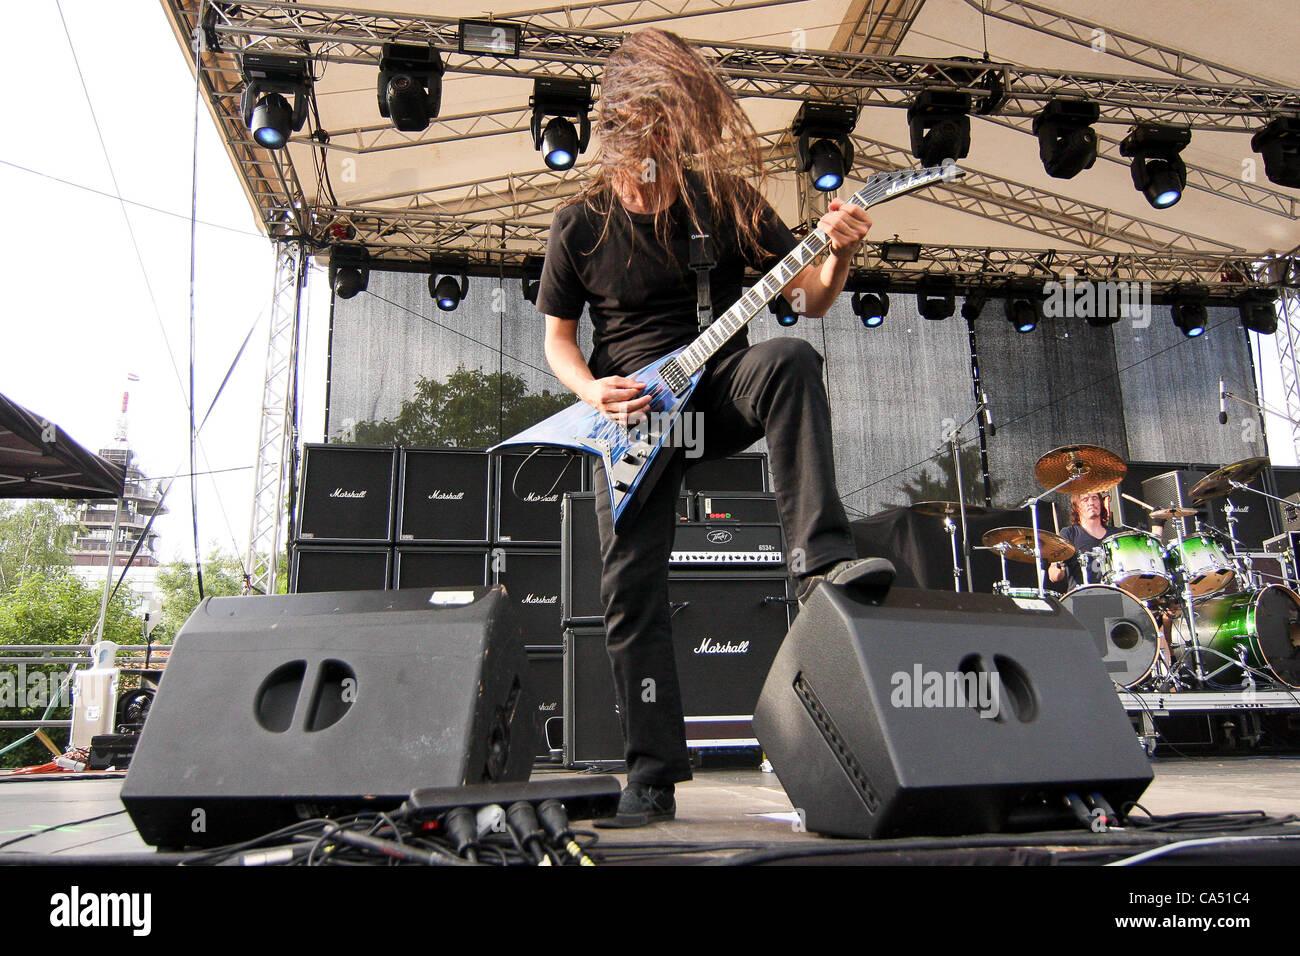 ZAGREB, CROATIA, June 8 2012. Christian Andreu (guitar) of the band Gojira performing at Rokaj (trans: Rock!) festival - Stock Image